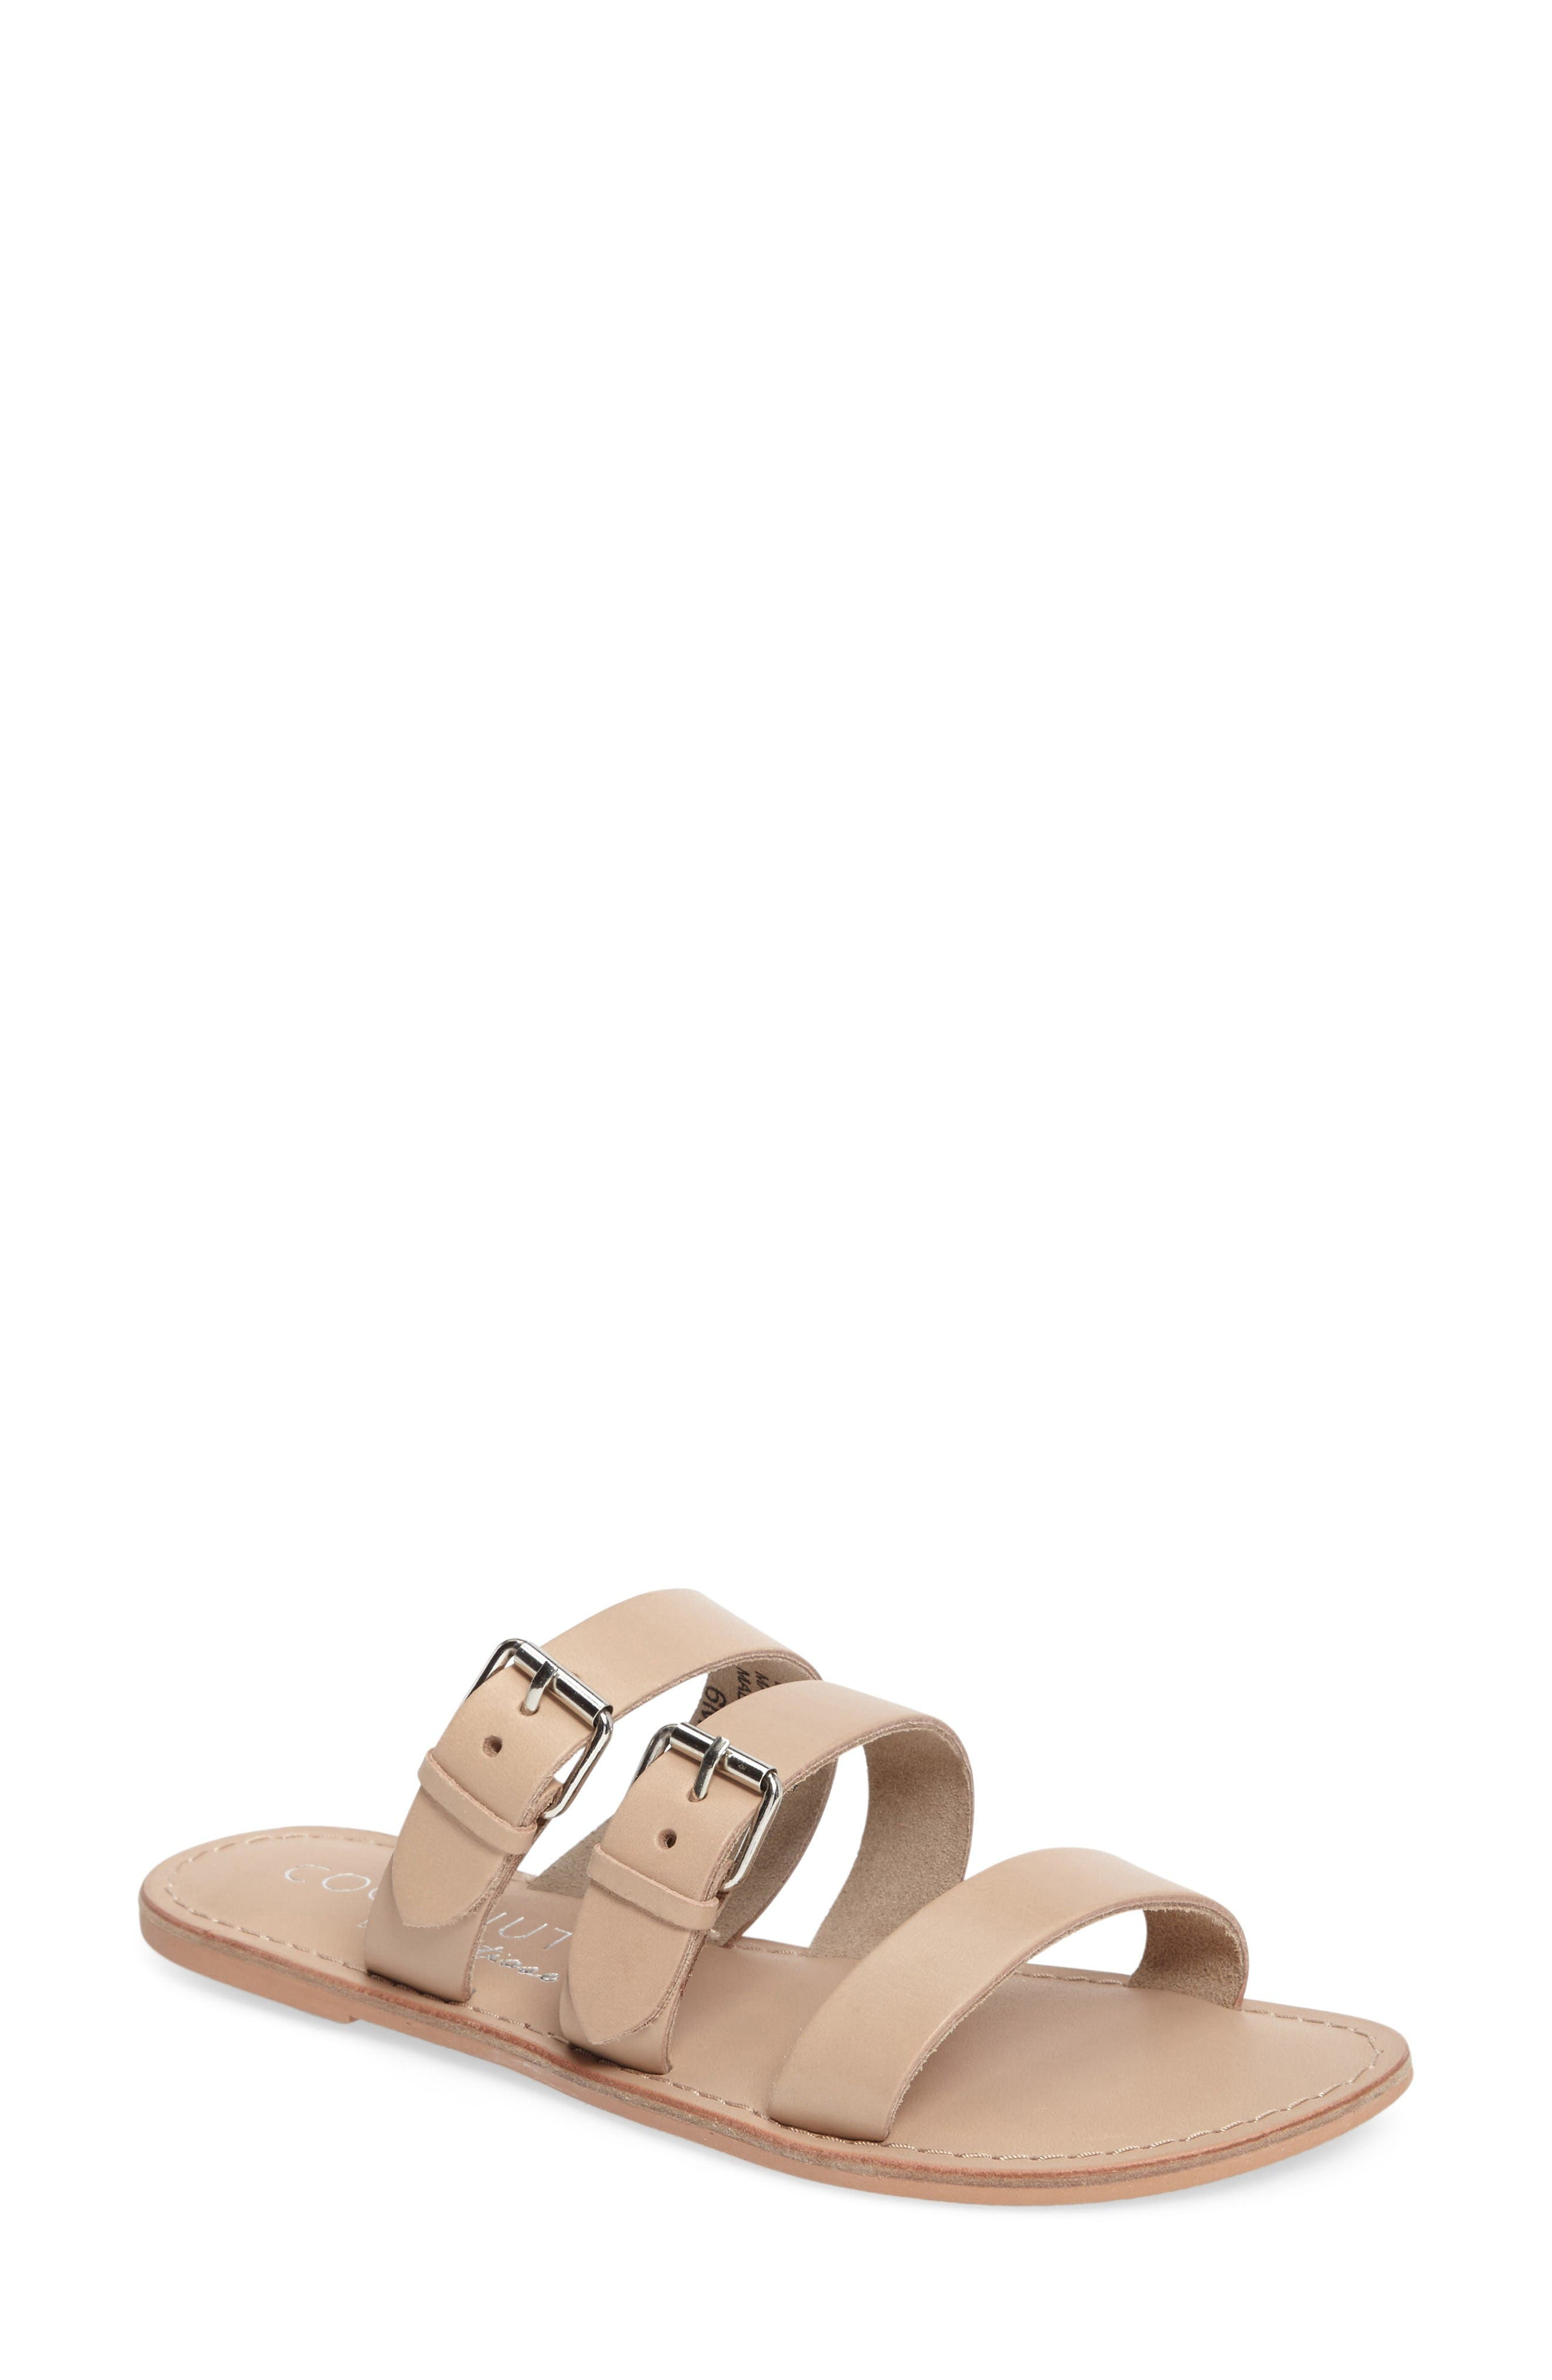 Matisse Wisp Slide Sandal (Women)